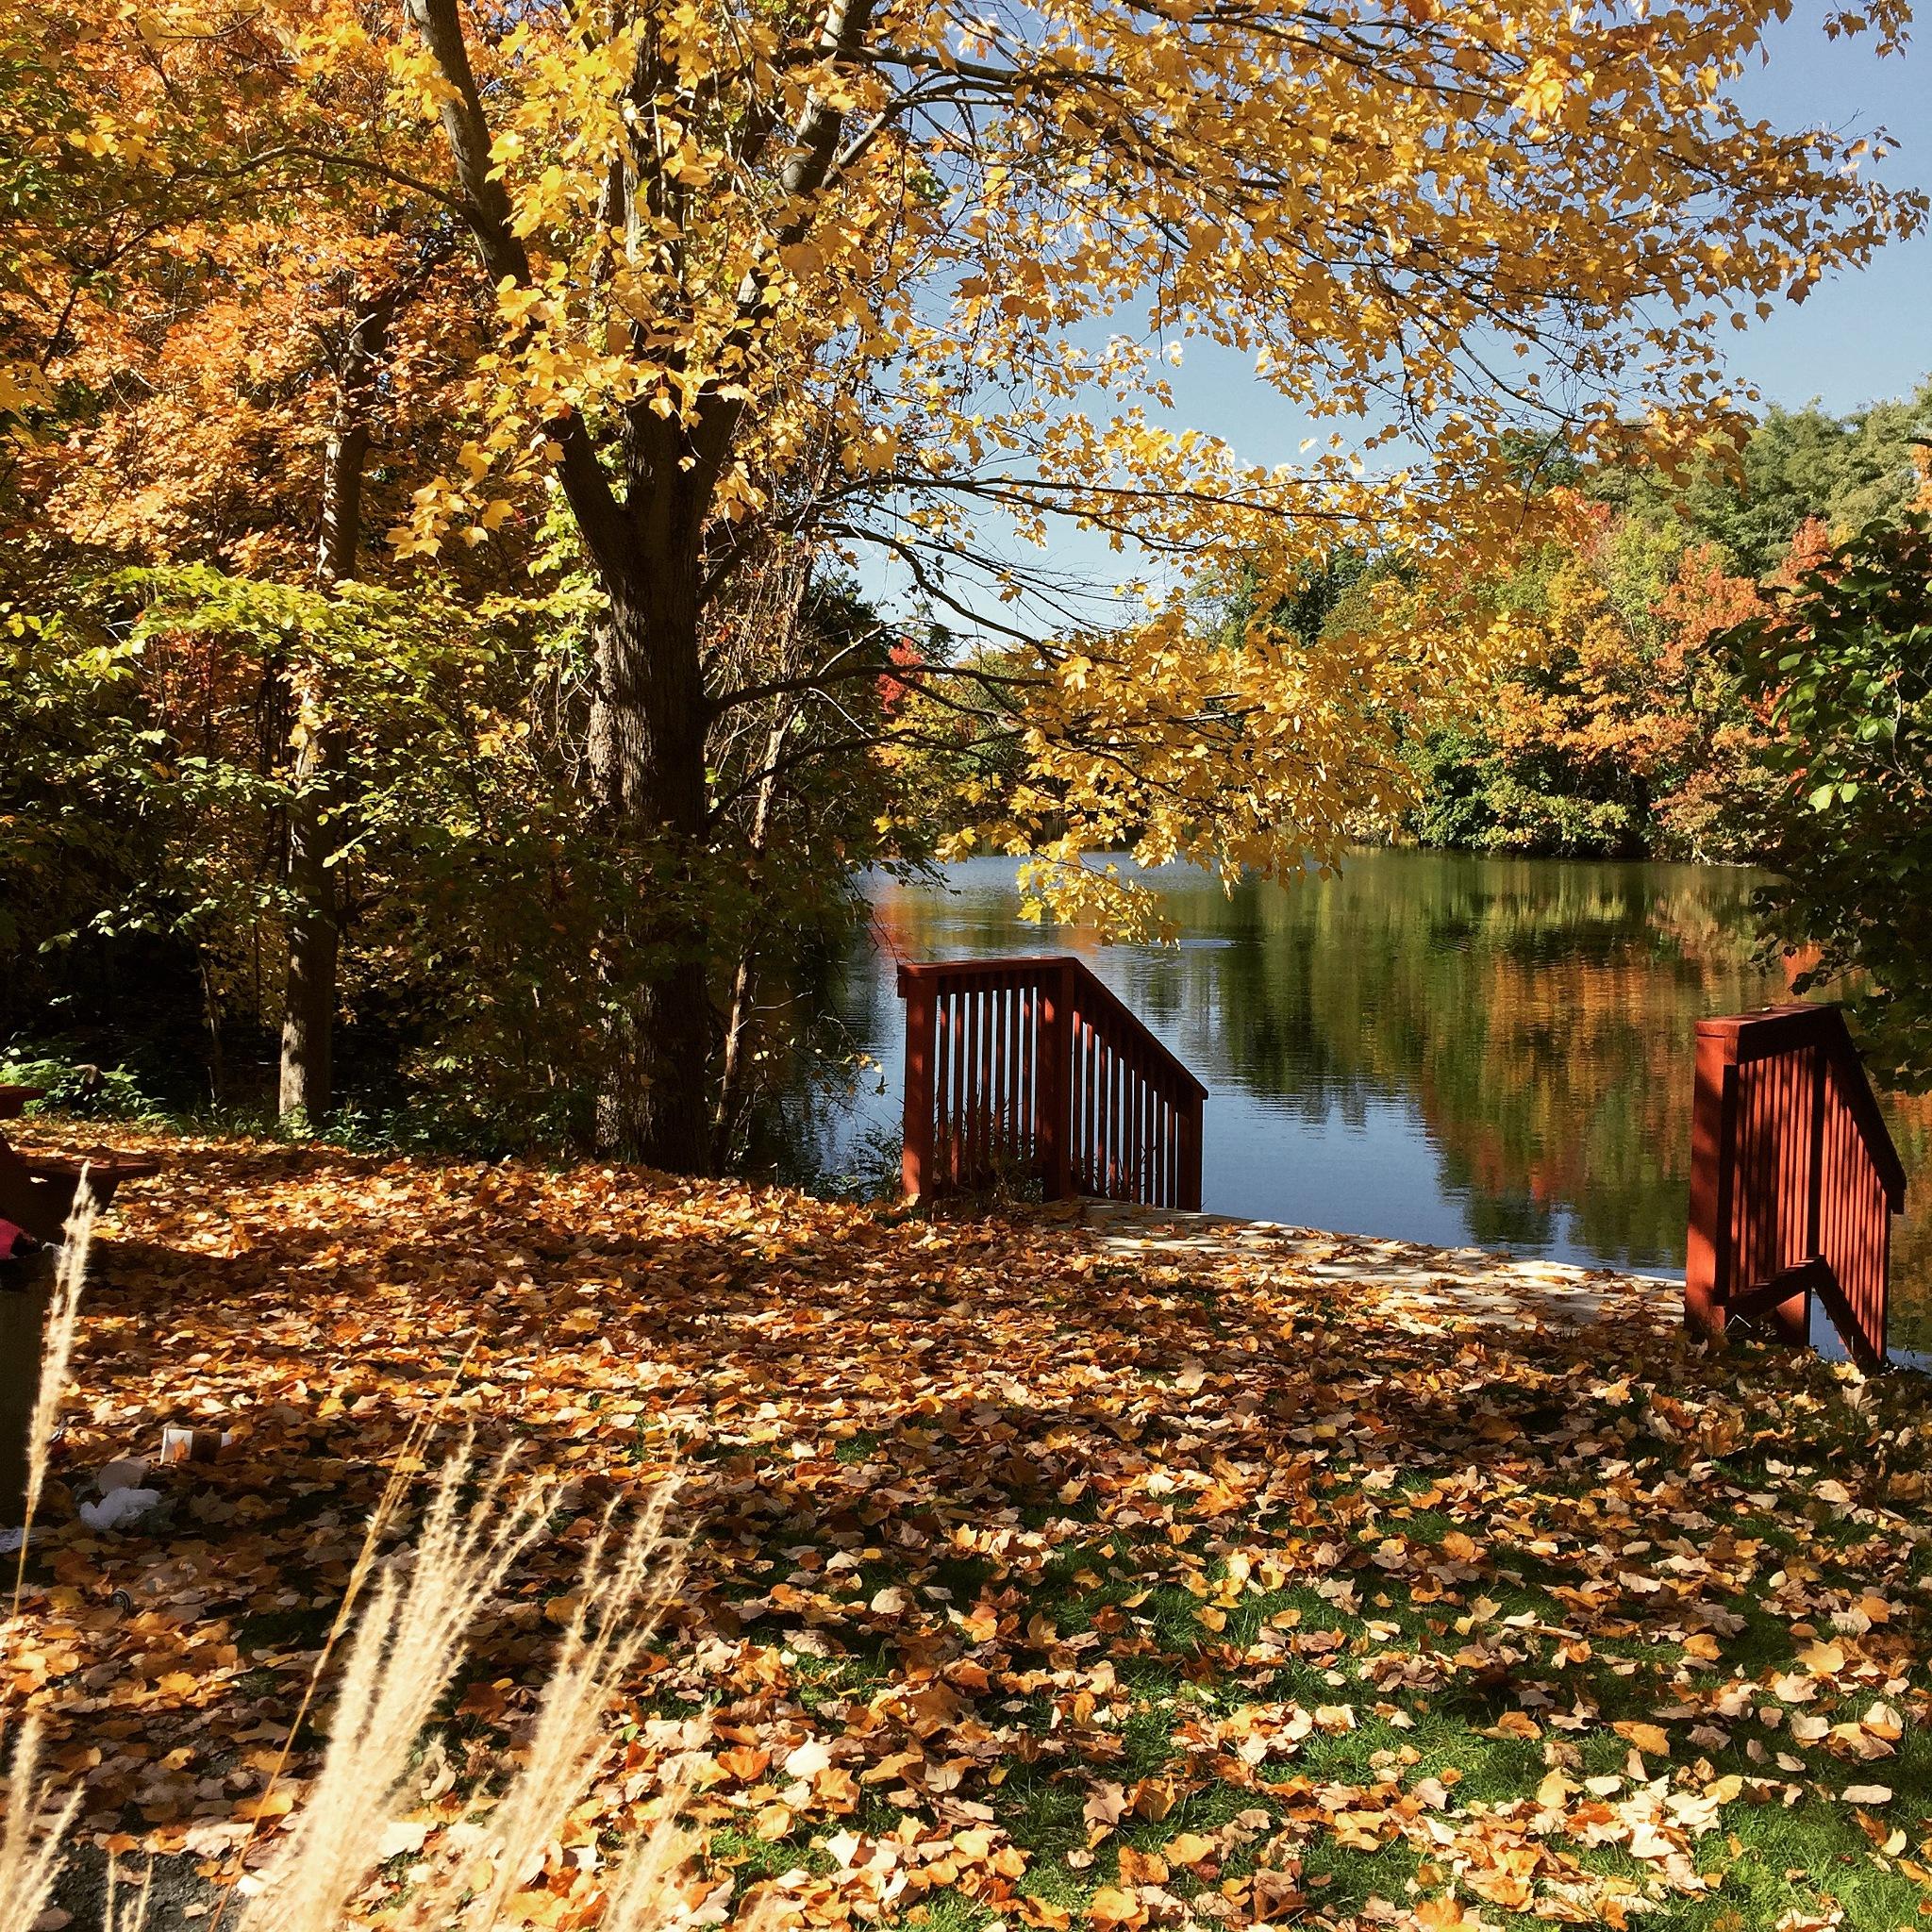 Autumn Splendor by Ilovecats7